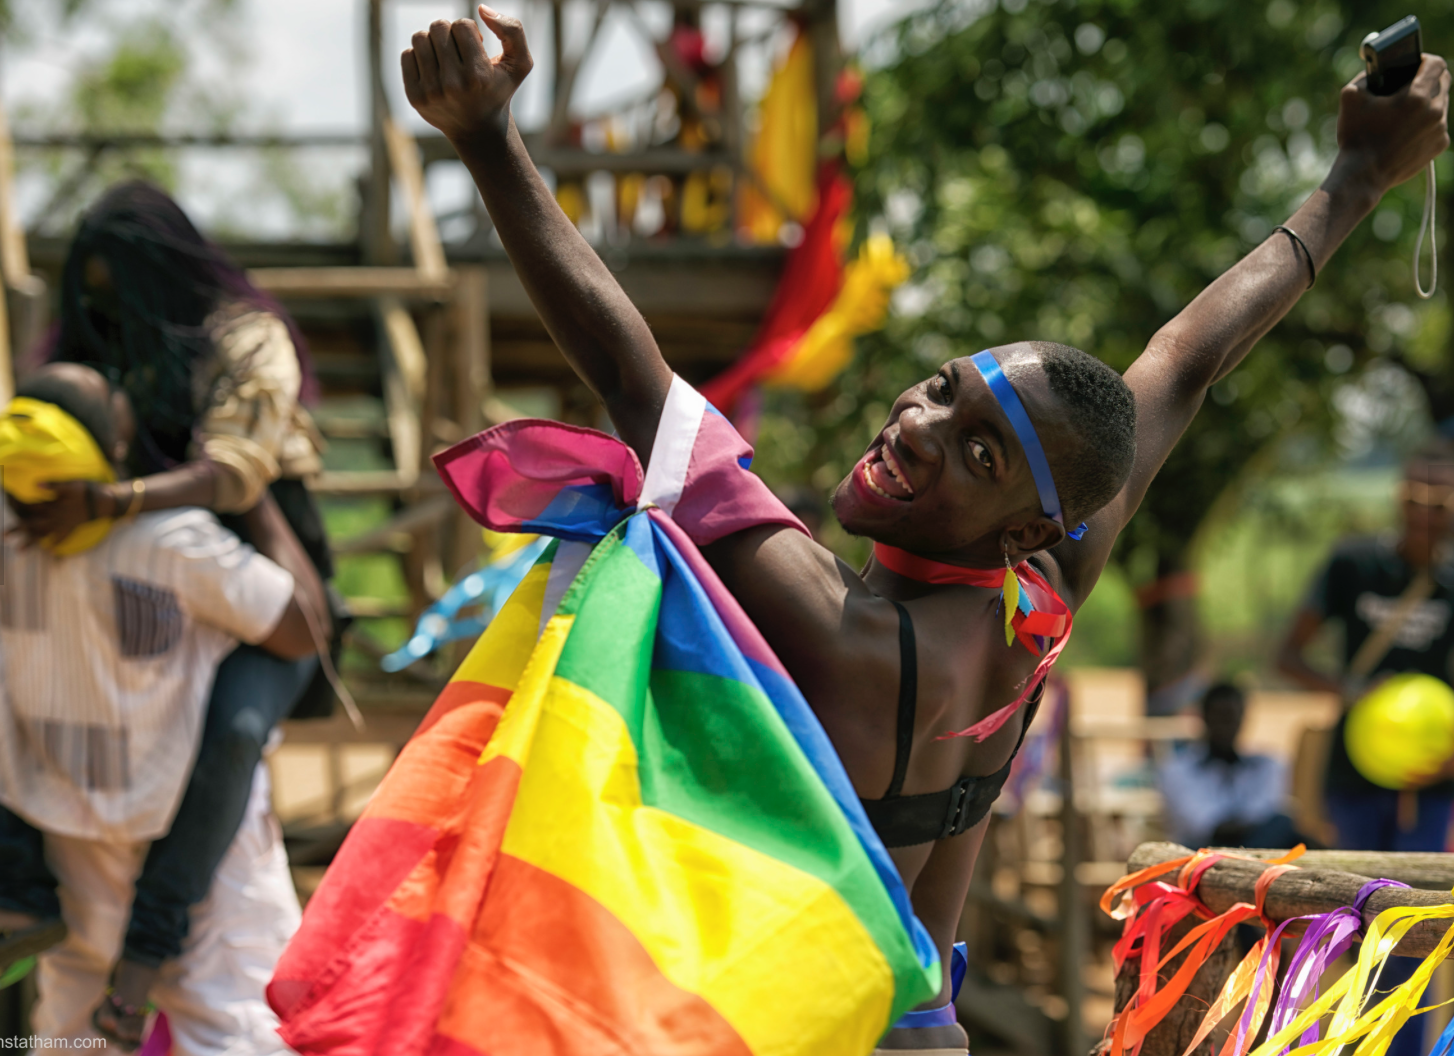 LGBTQ pride - entebbe, uganda